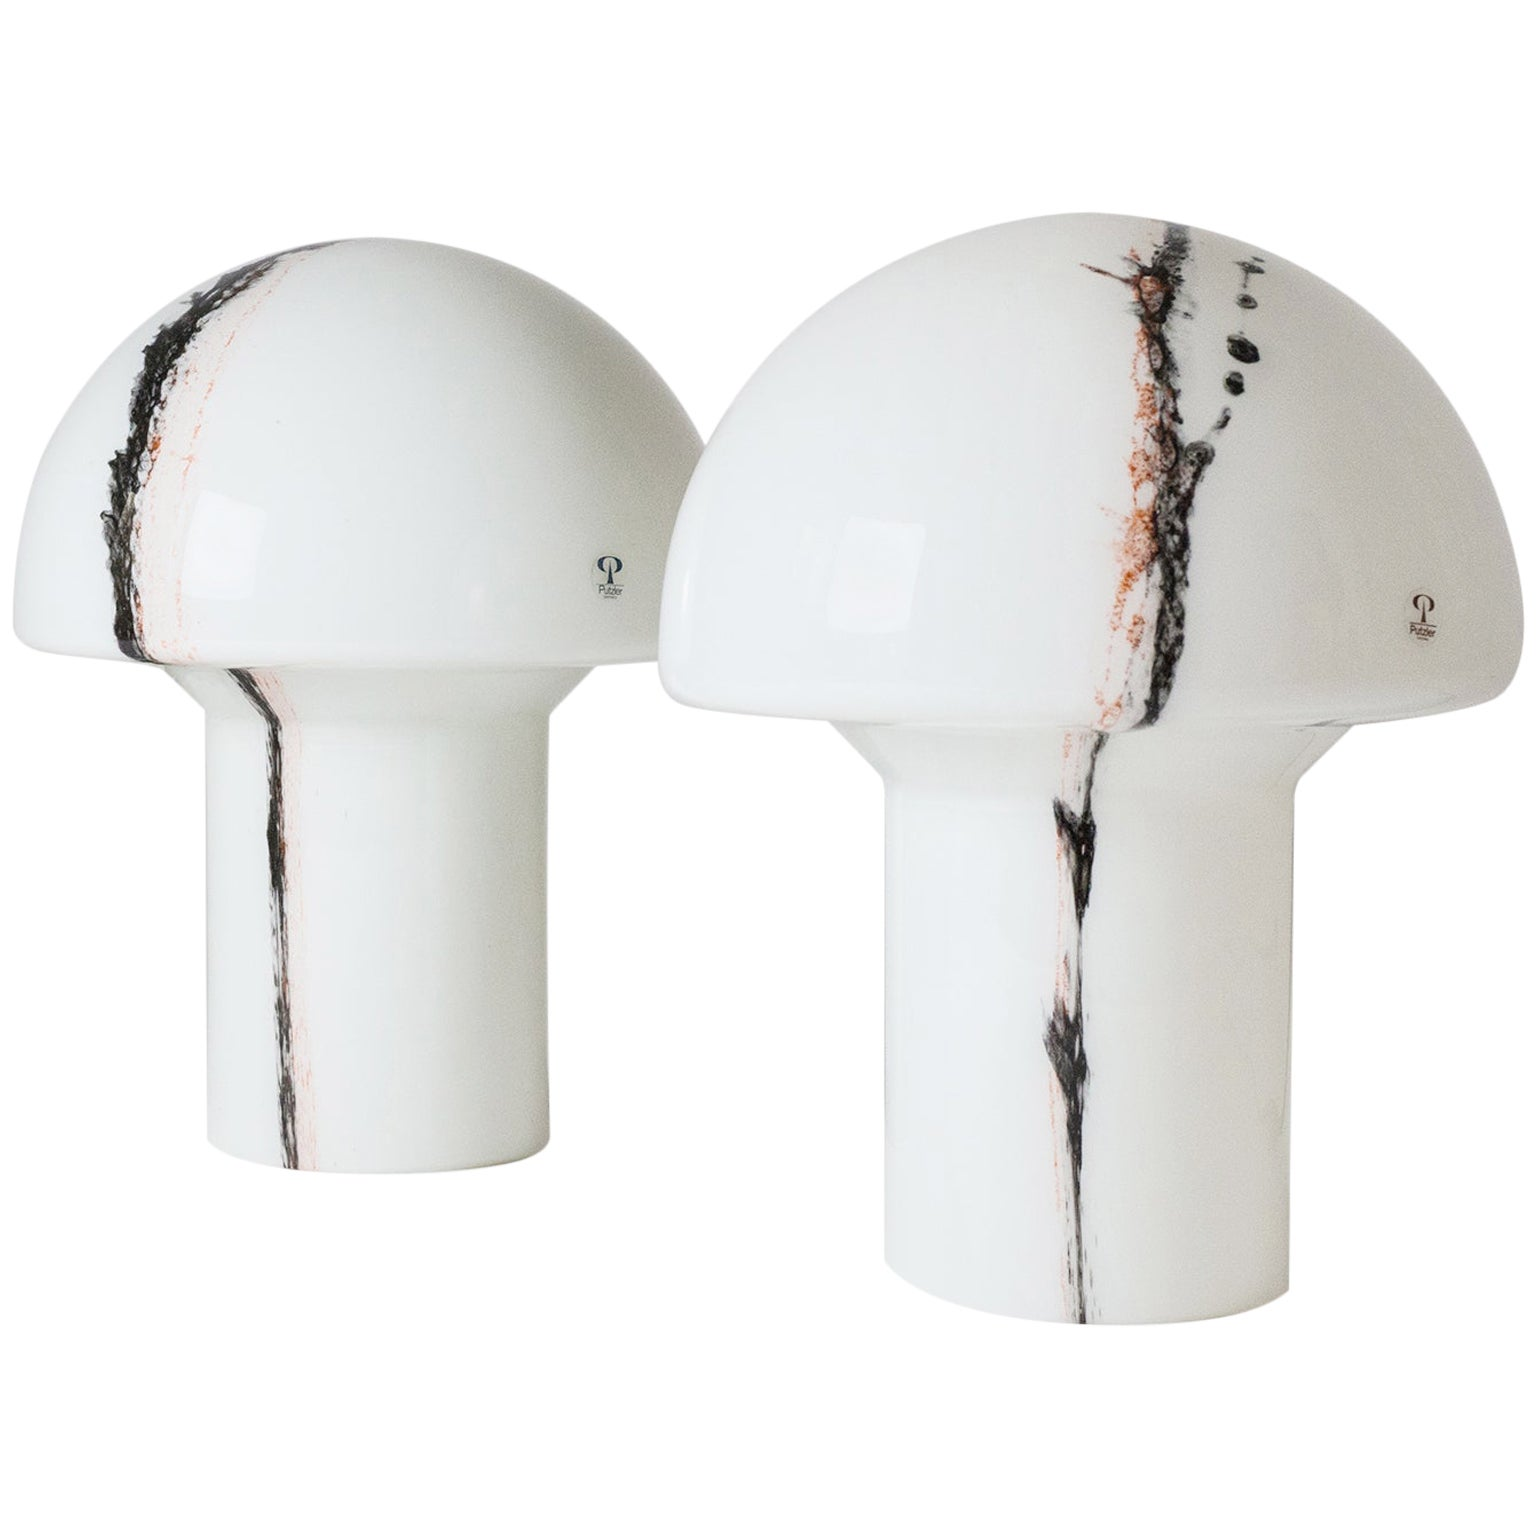 Pair of Glass Mushroom Table Lamps, 1970s